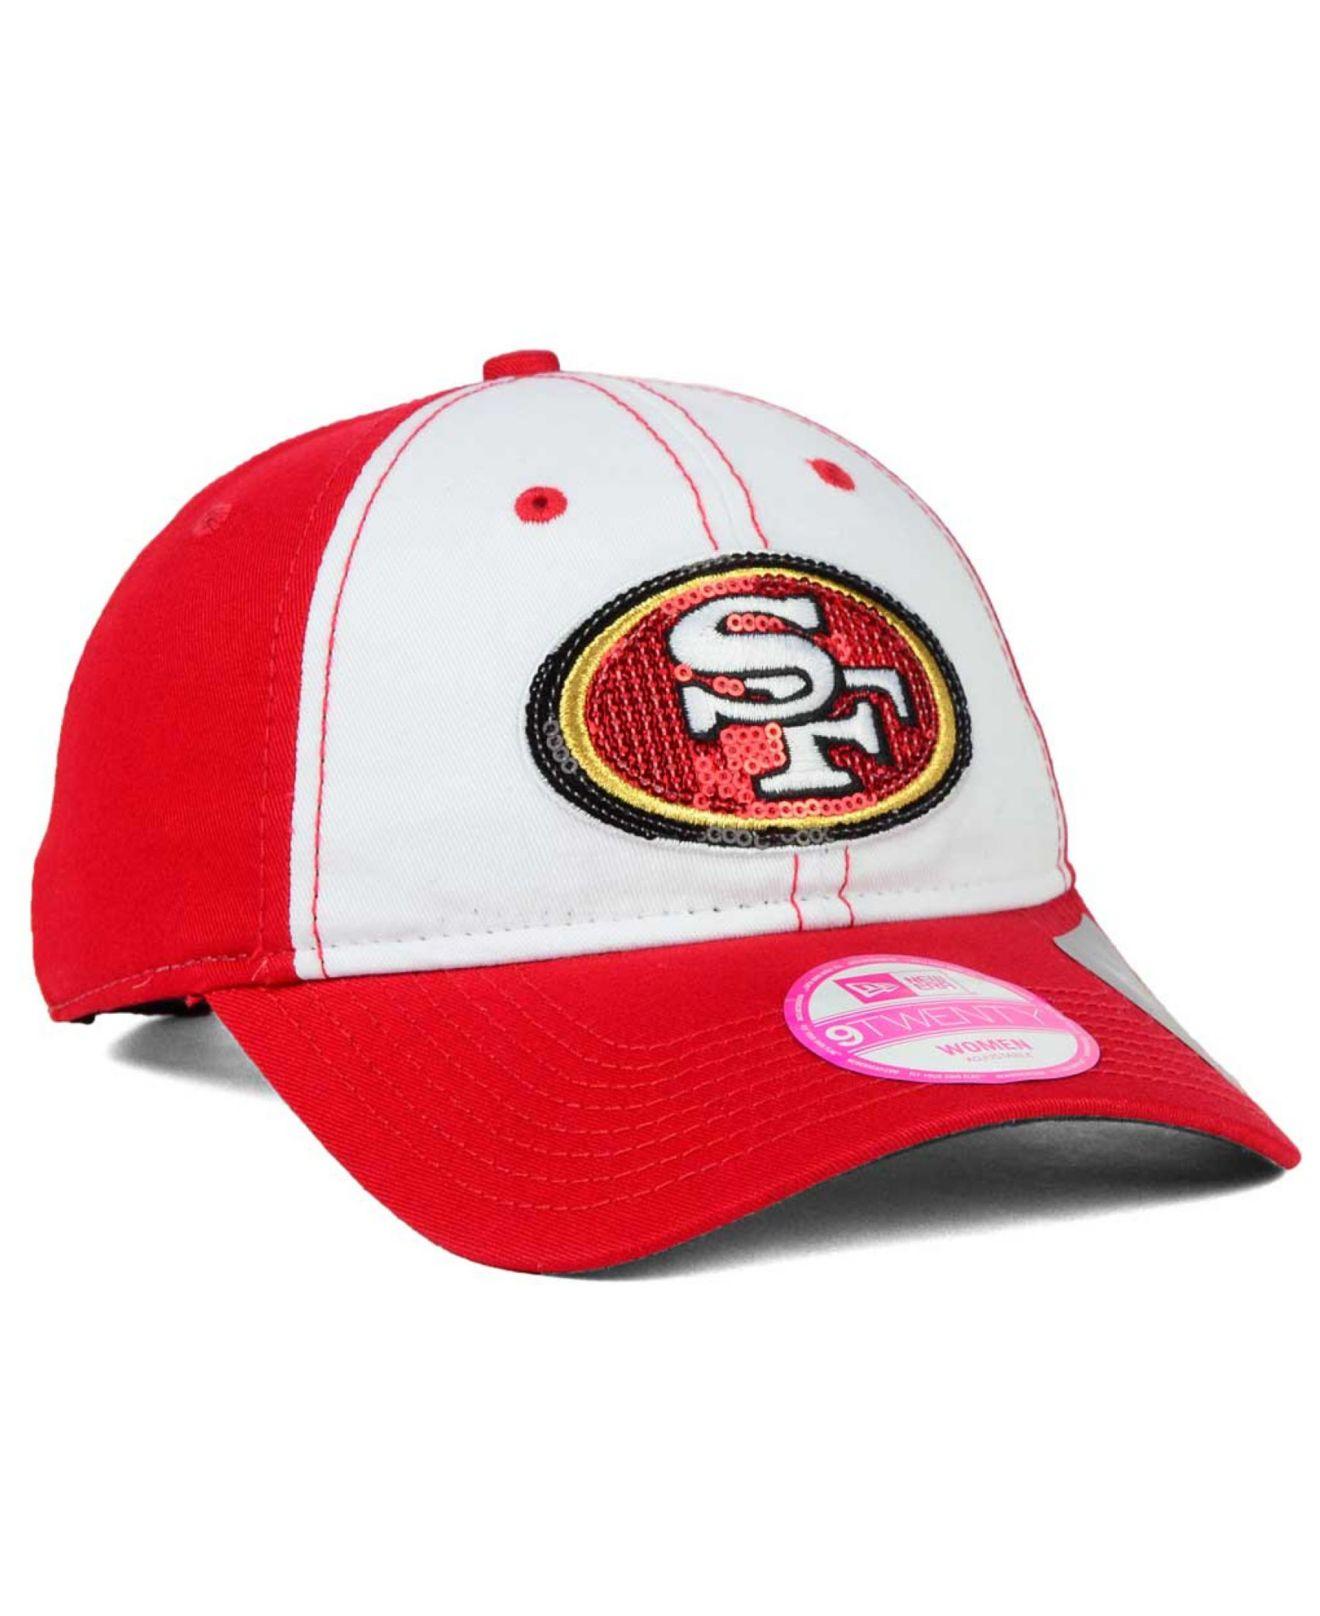 detailed look 17557 f038d Lyst - Ktz Women s San Francisco 49ers Team Glimmer 9twenty Cap in Red